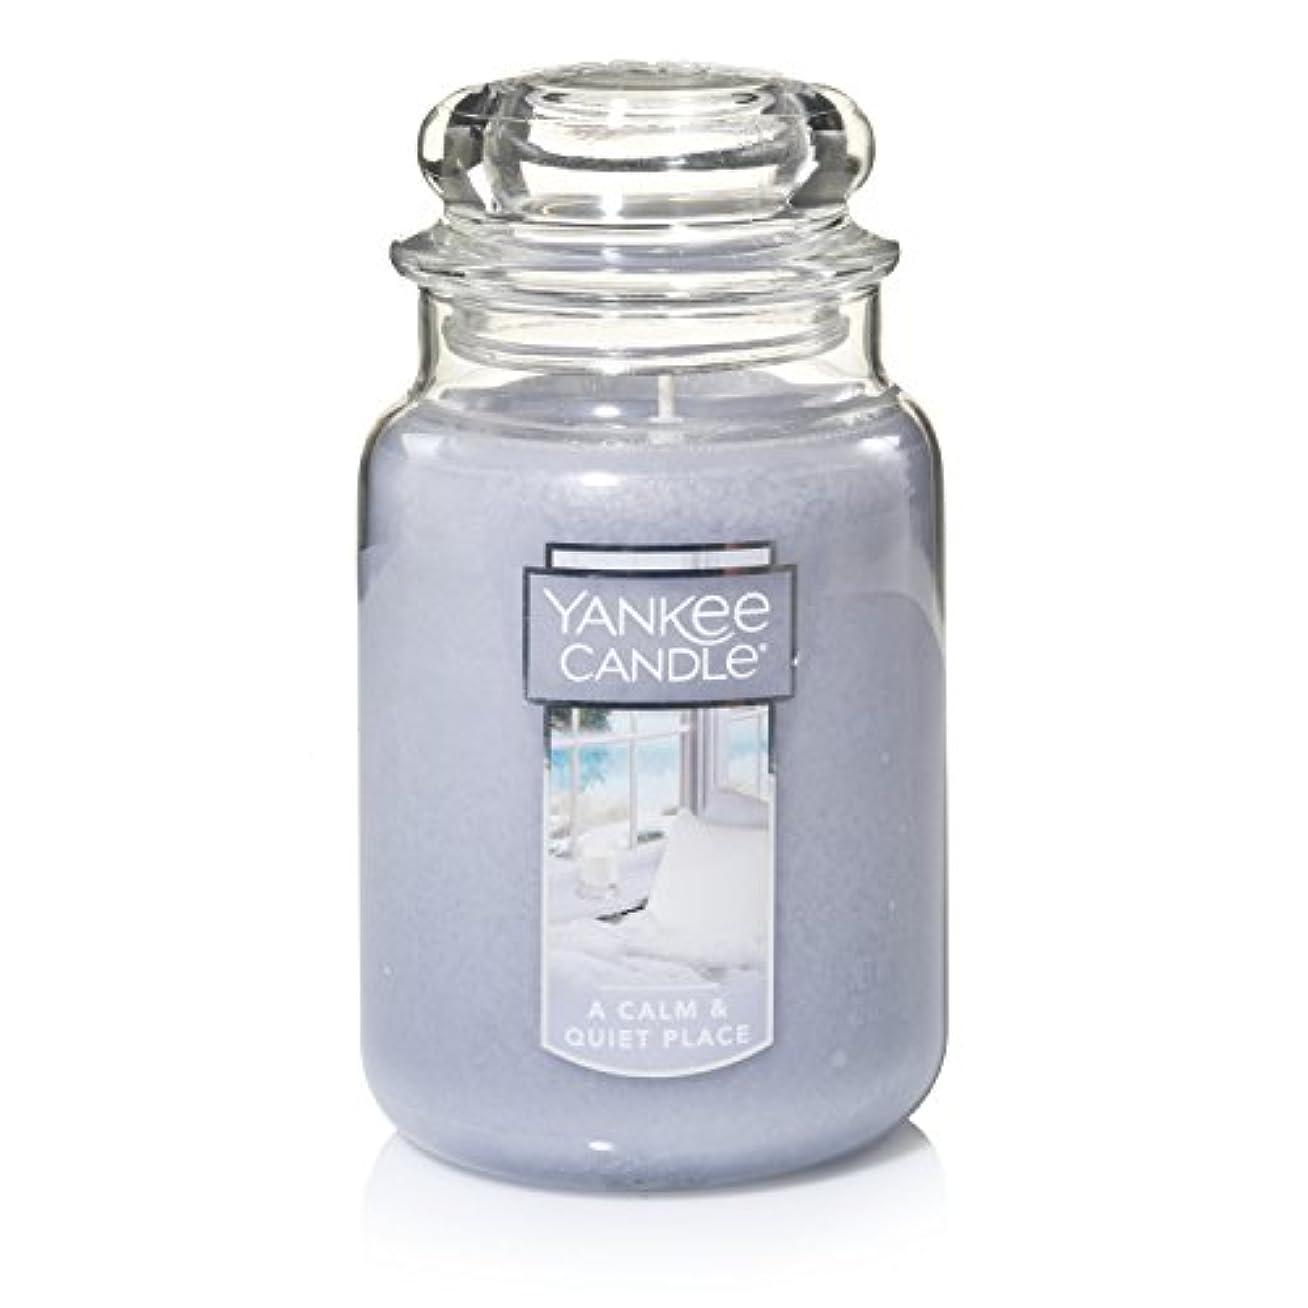 霧密度支配的Yankee Candle A Calm & Quiet Place Jar Candle , Large